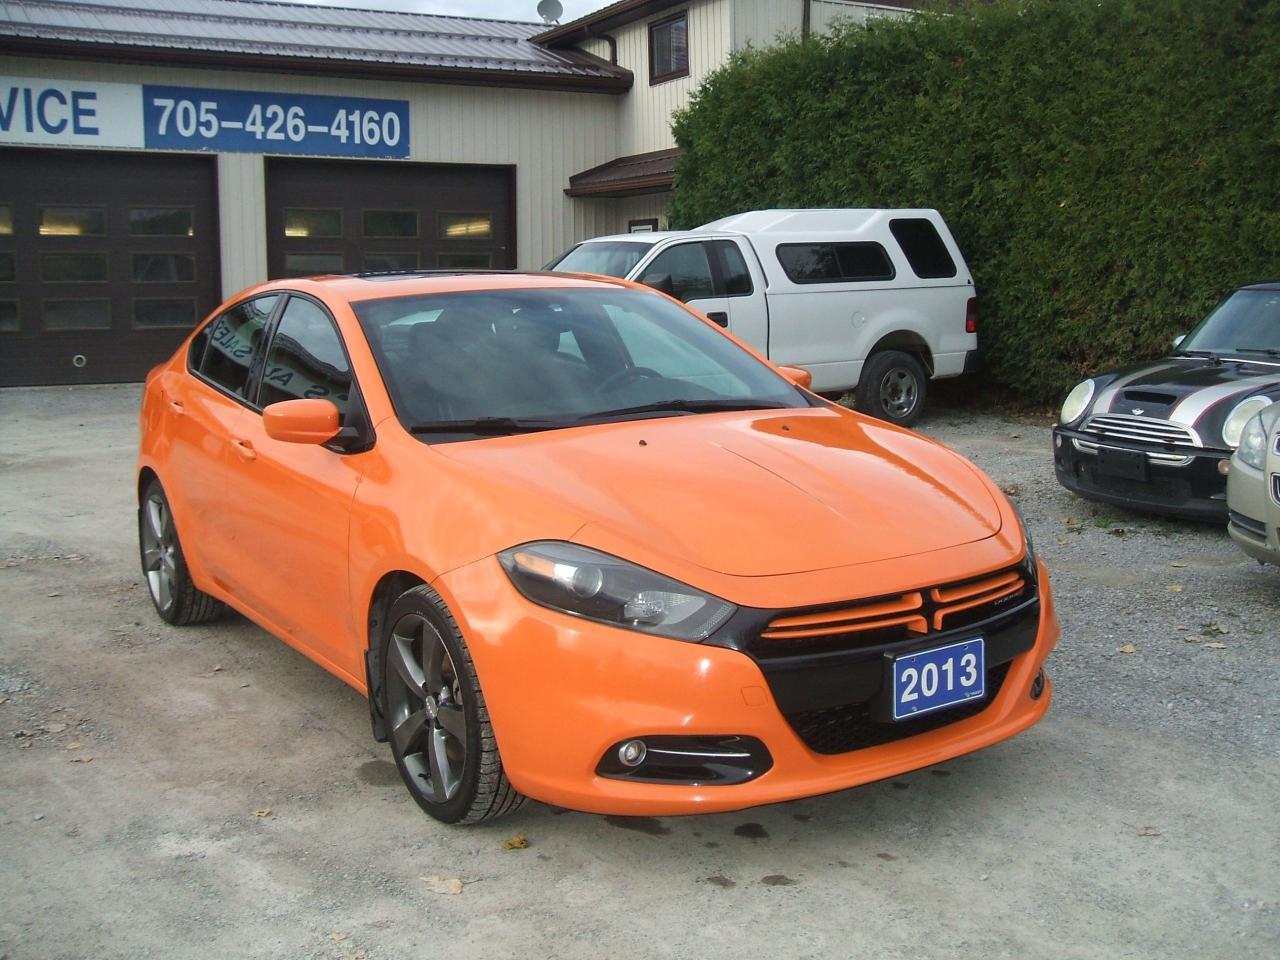 Photo of Orange 2013 Dodge Dart